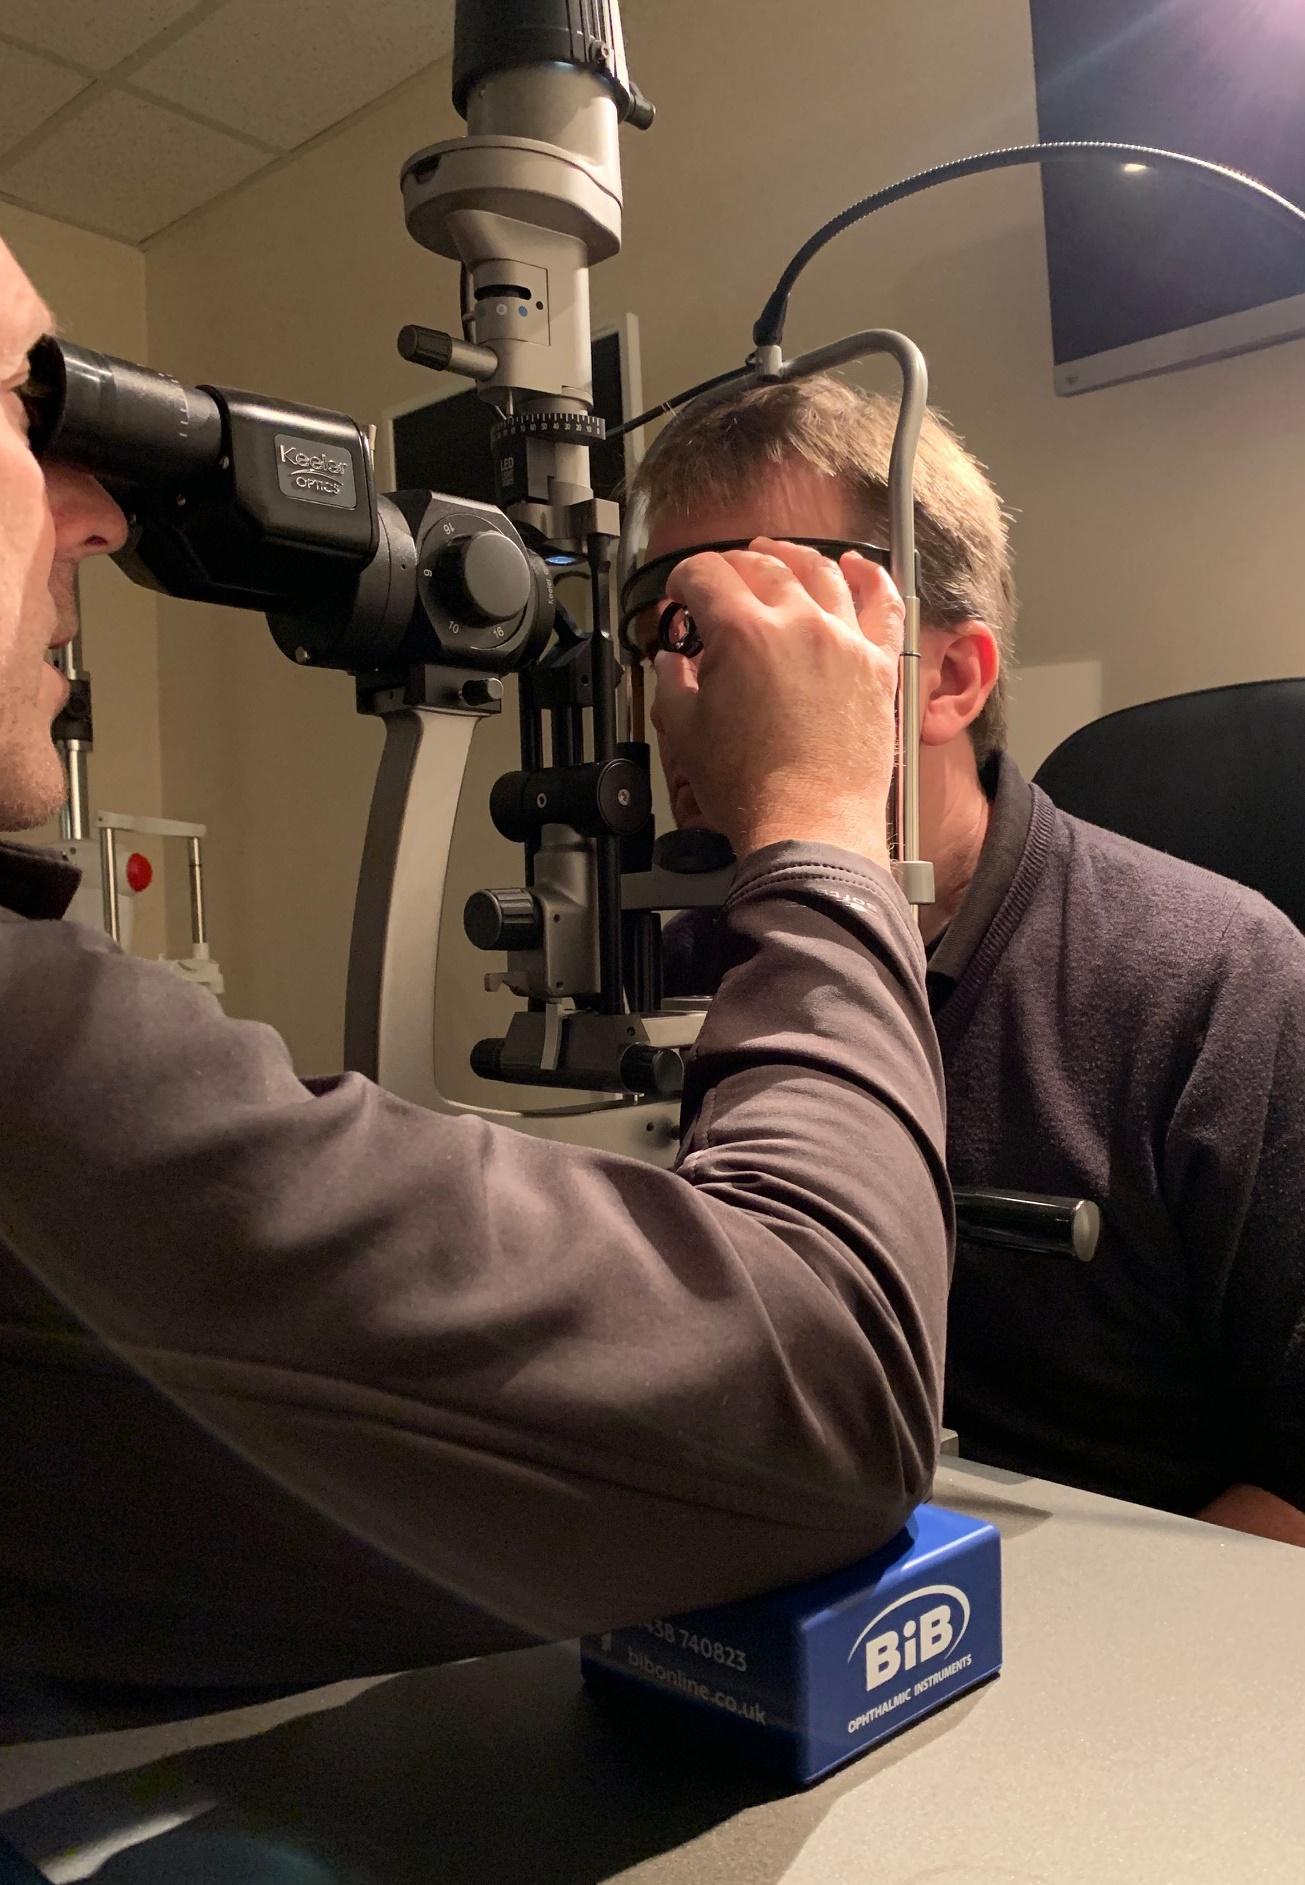 Elbow pad with Volk is use - BiB Ophthalmic Instruments | BiB